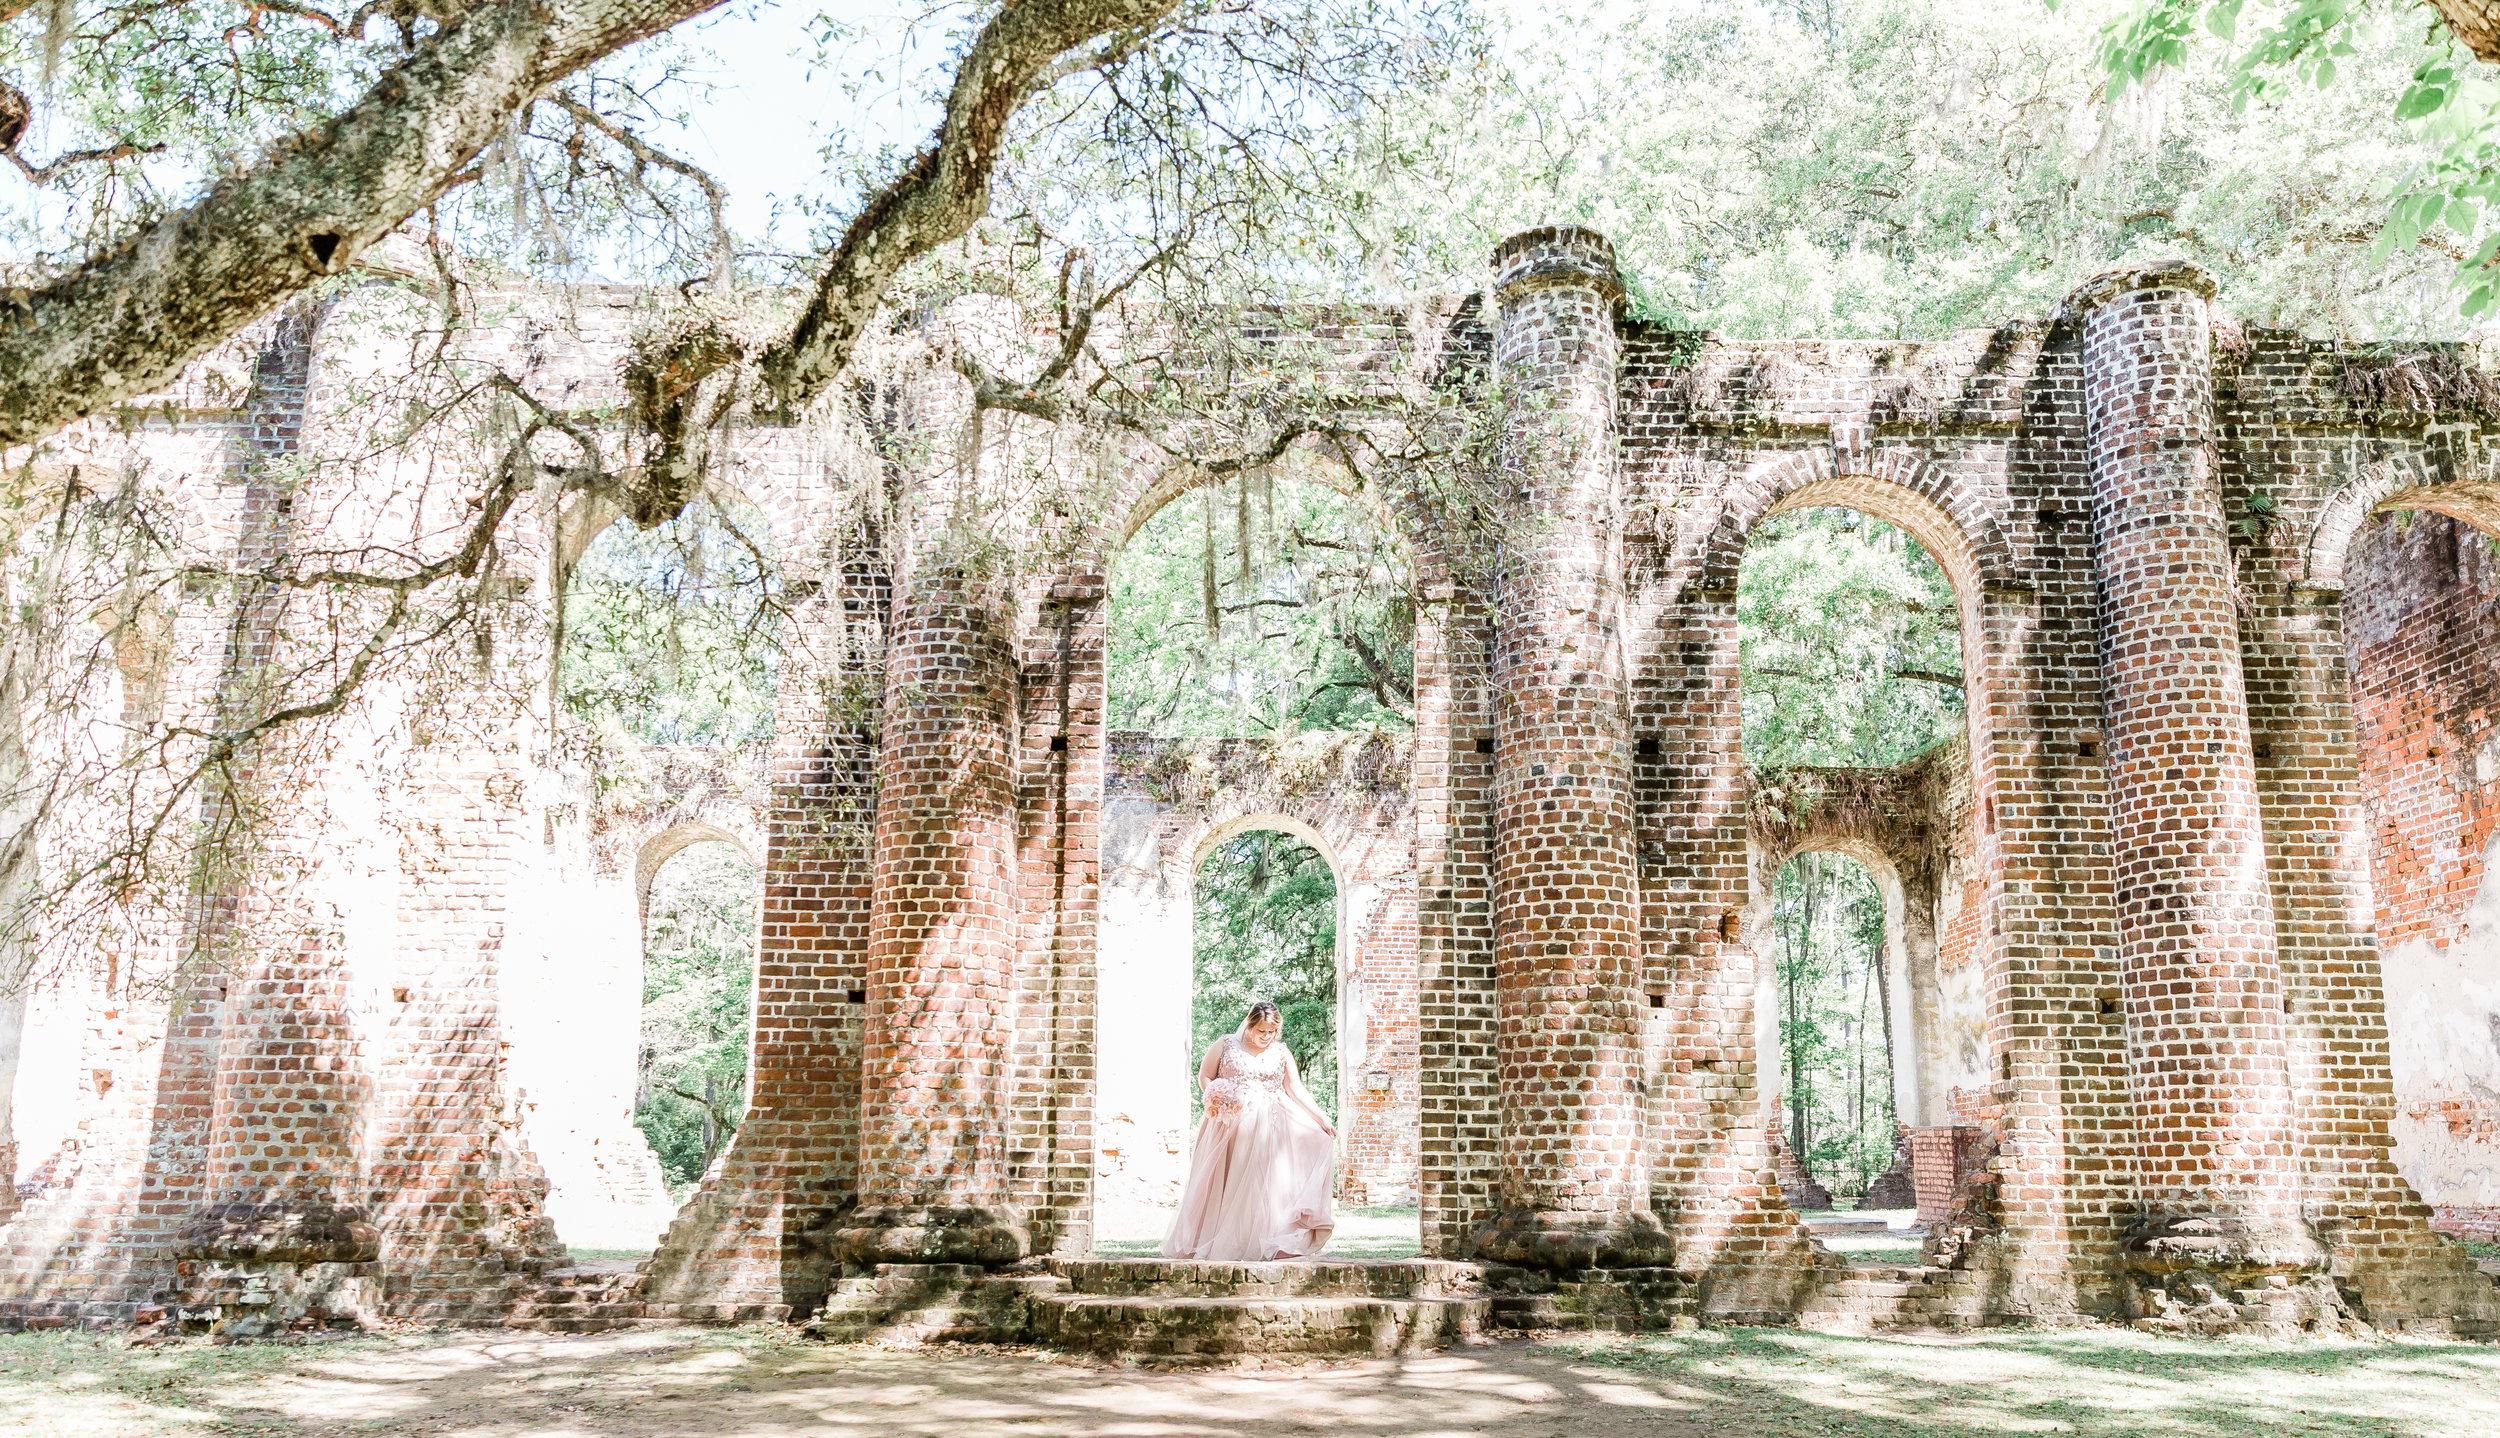 20190417-Southern Lens Photography-savannah family photographer- Ashley and Zack-old sheldon church ruins-201936.jpg